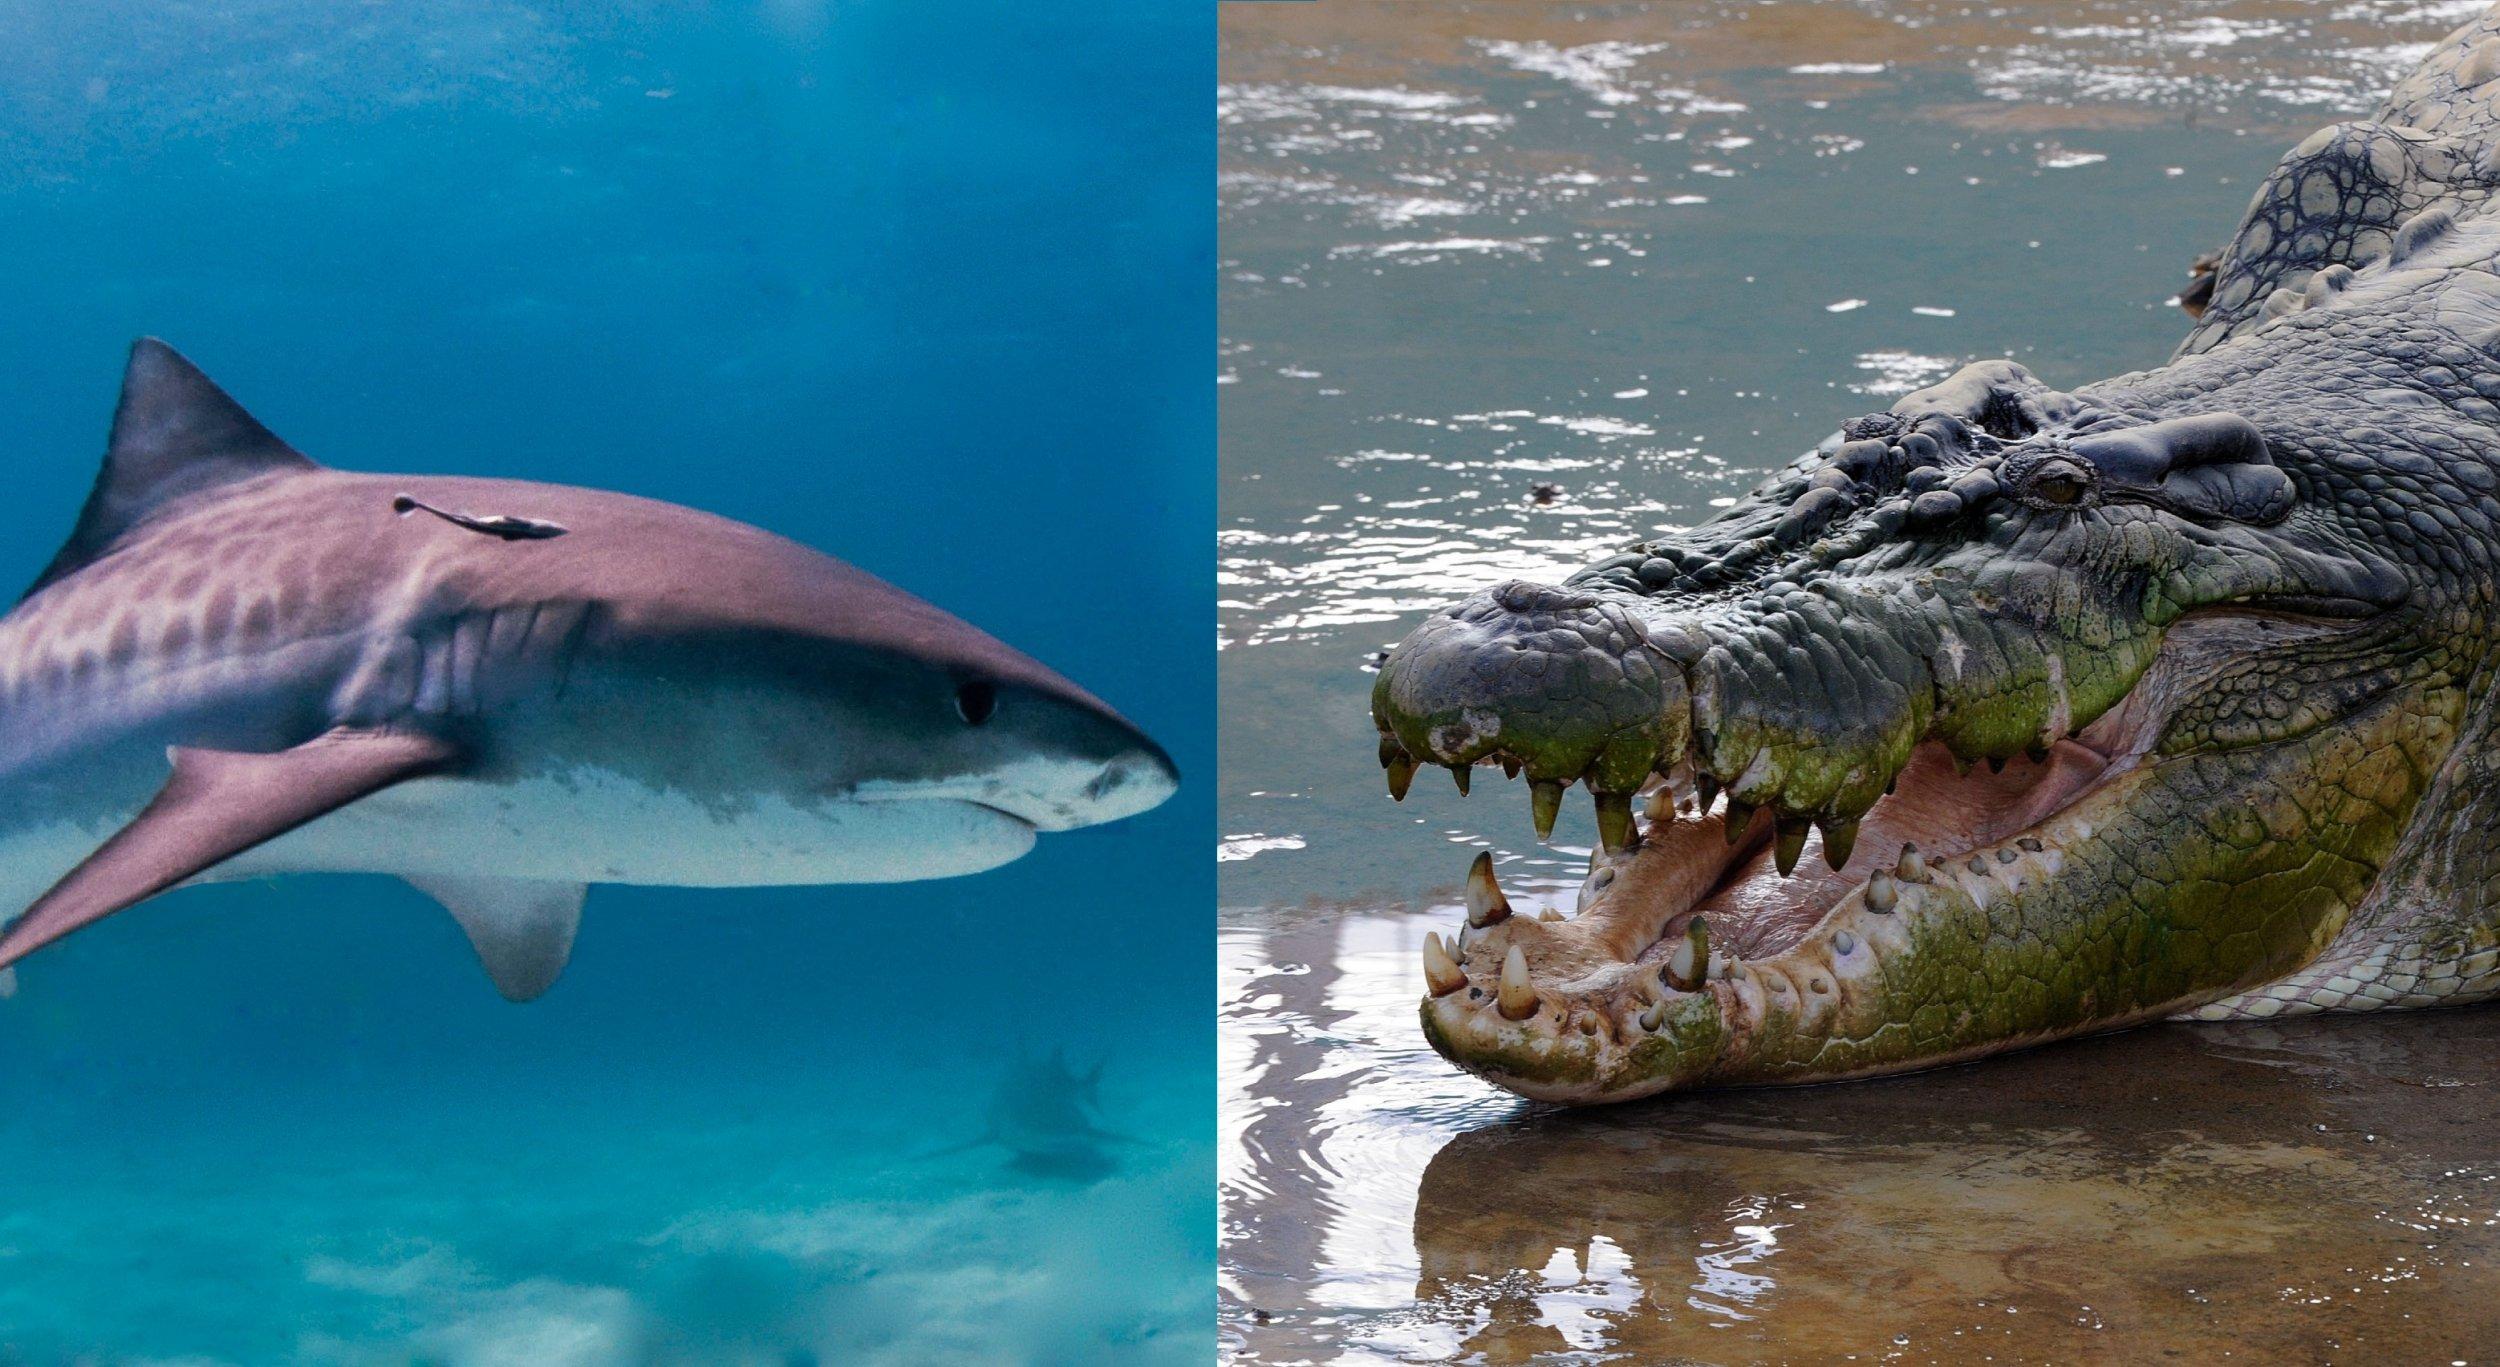 Saltwater crocodile vs tiger - photo#39